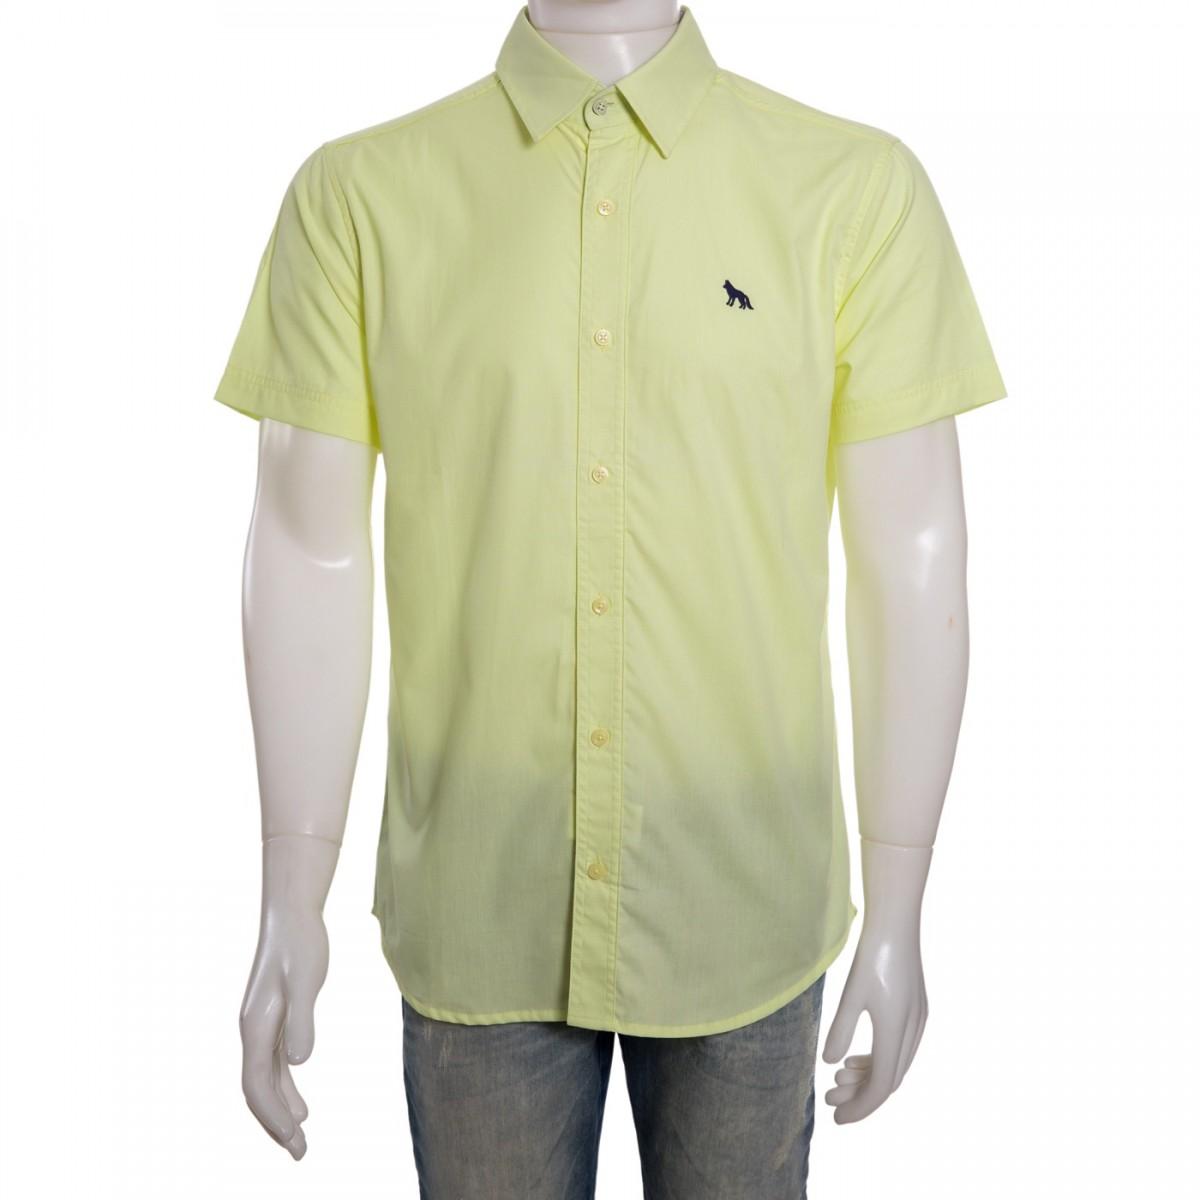 09e458e4e Bizz Store - Camisa Social Masculina Acostamento Manga Curta